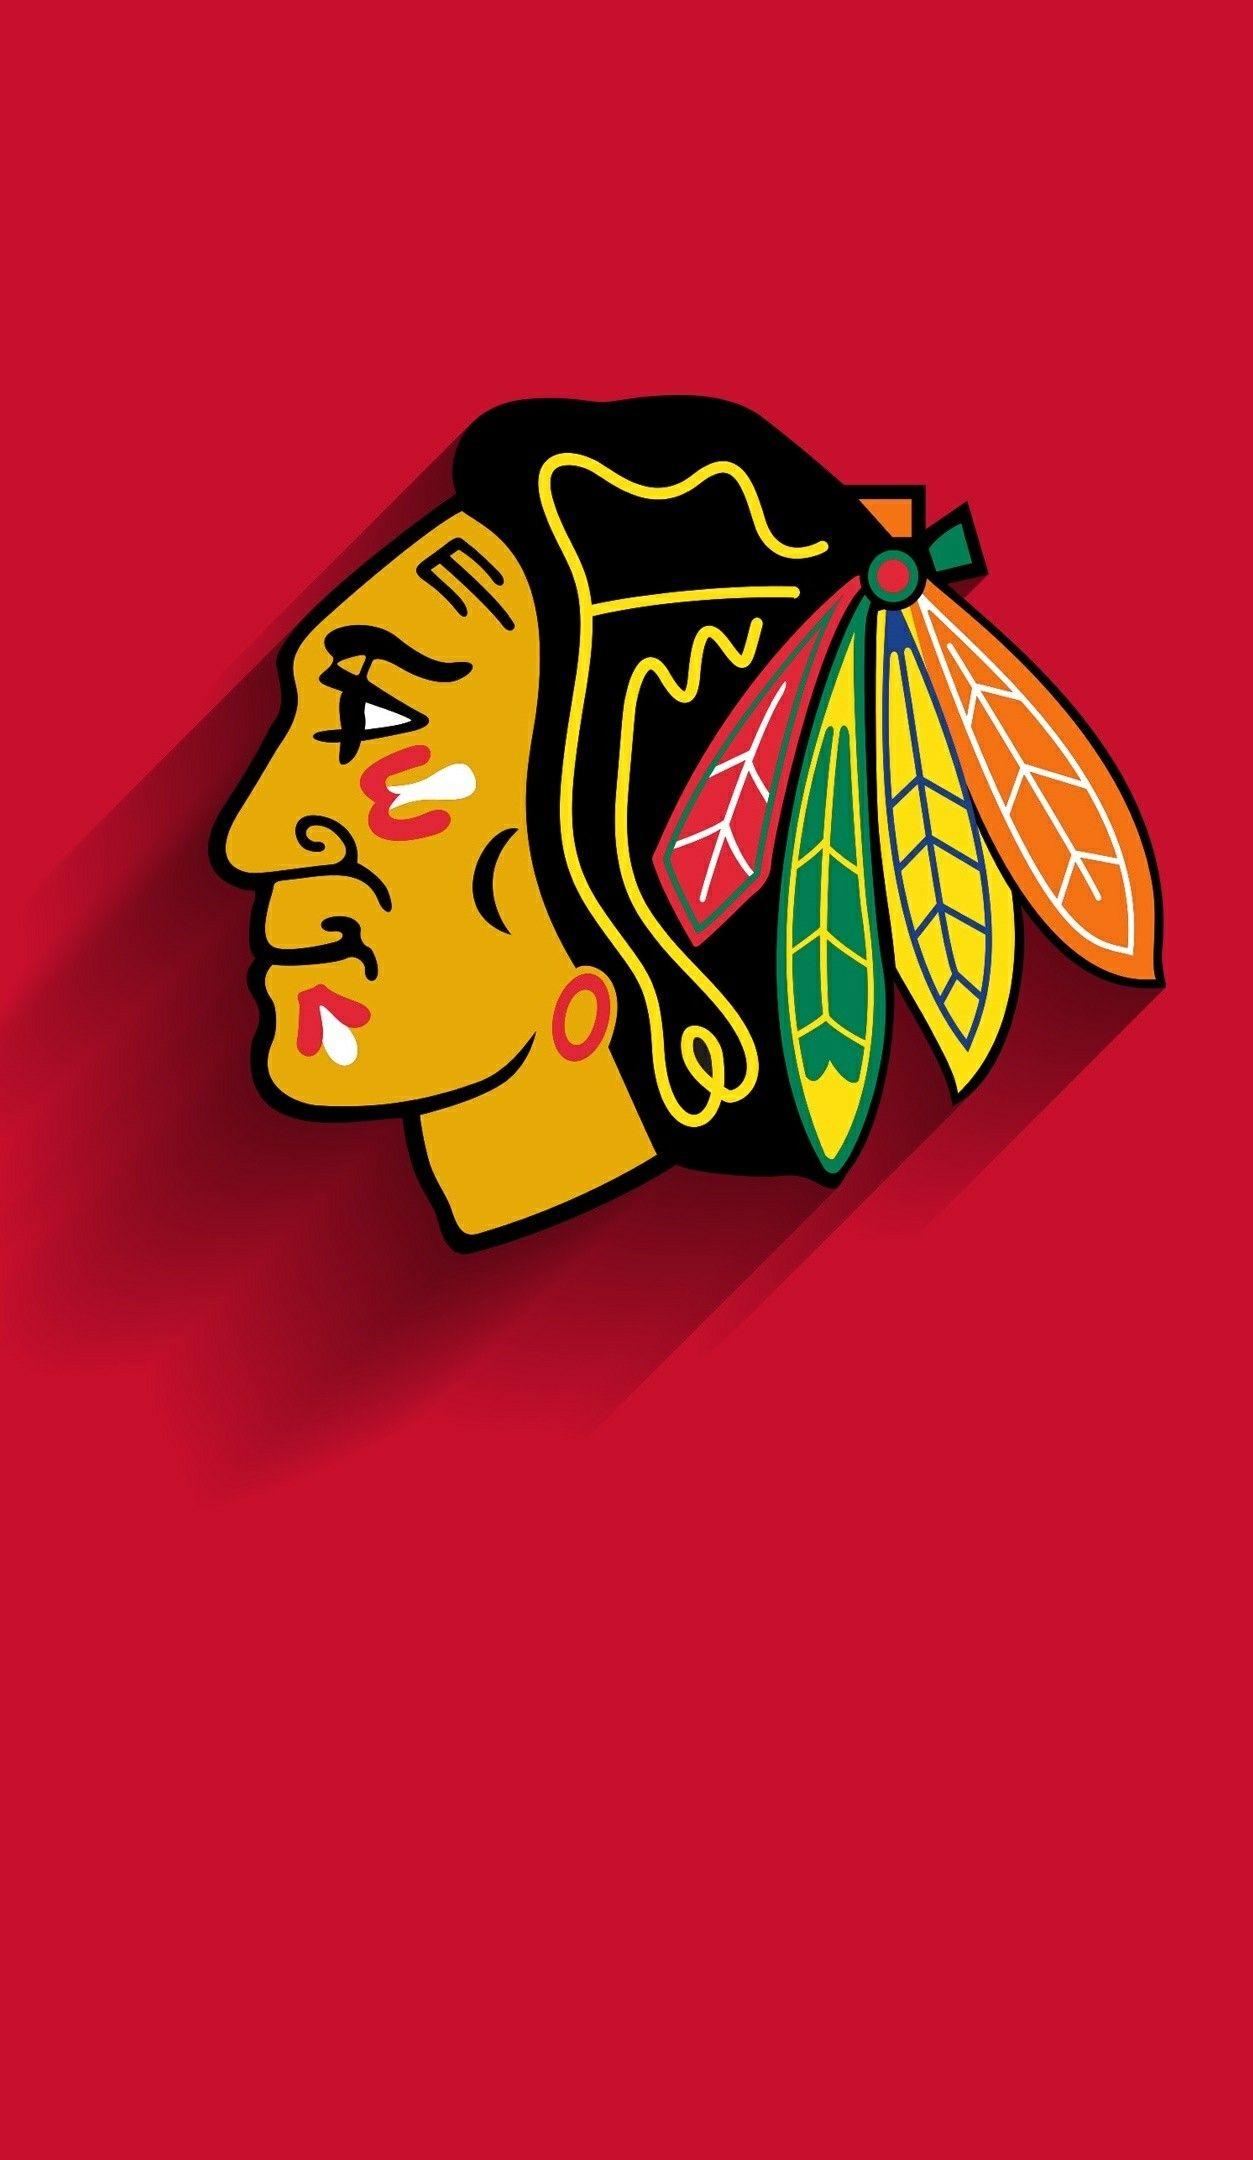 Pin By 2025 Samson On Hockey Chicago Blackhawks Wallpaper Chicago Blackhawks Logo Blackhawks Hockey